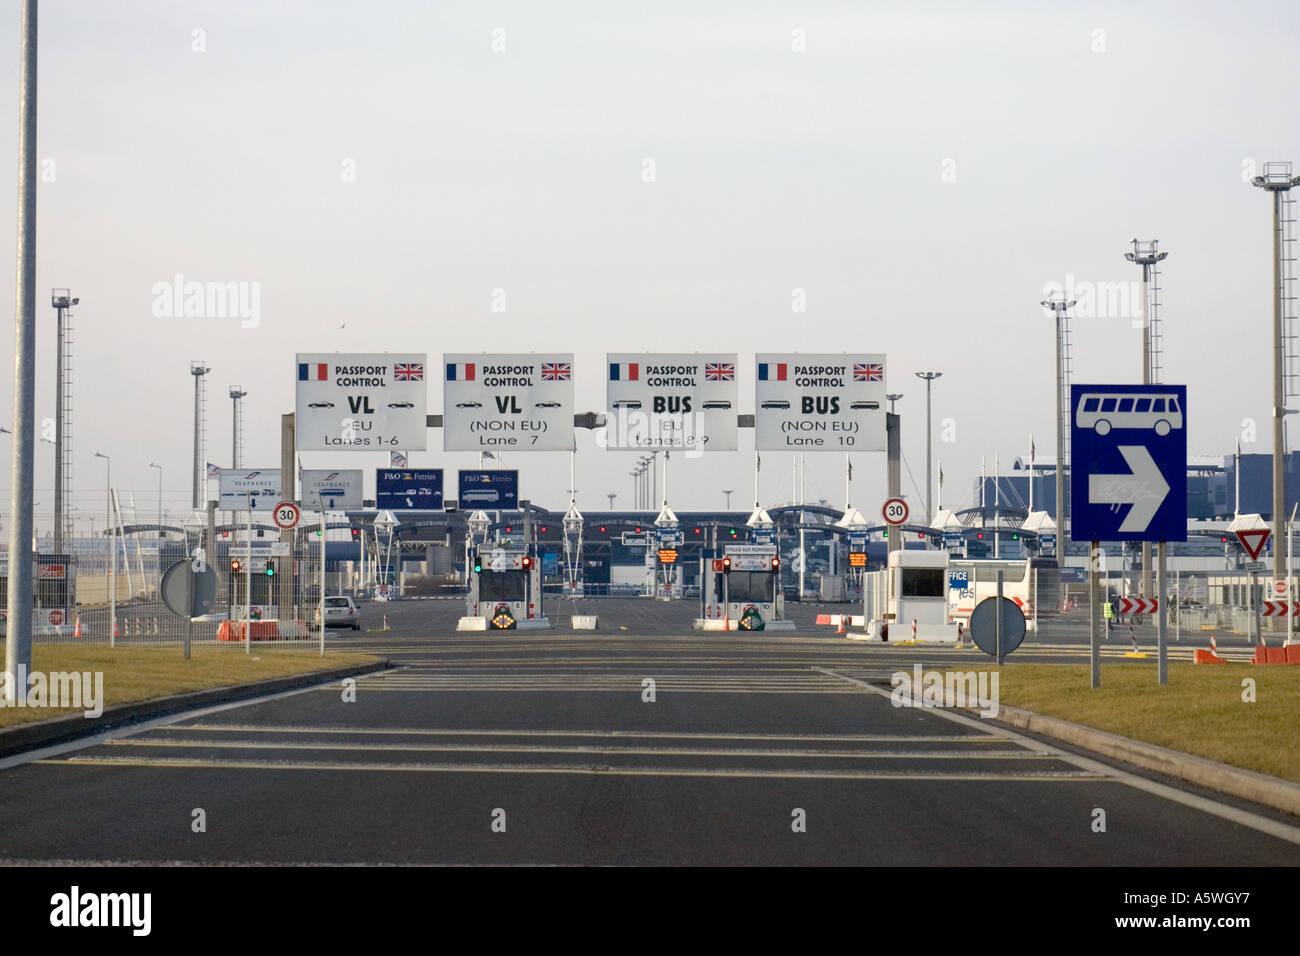 Passport Control Calais ferry port France Nord Pas-de-Calais